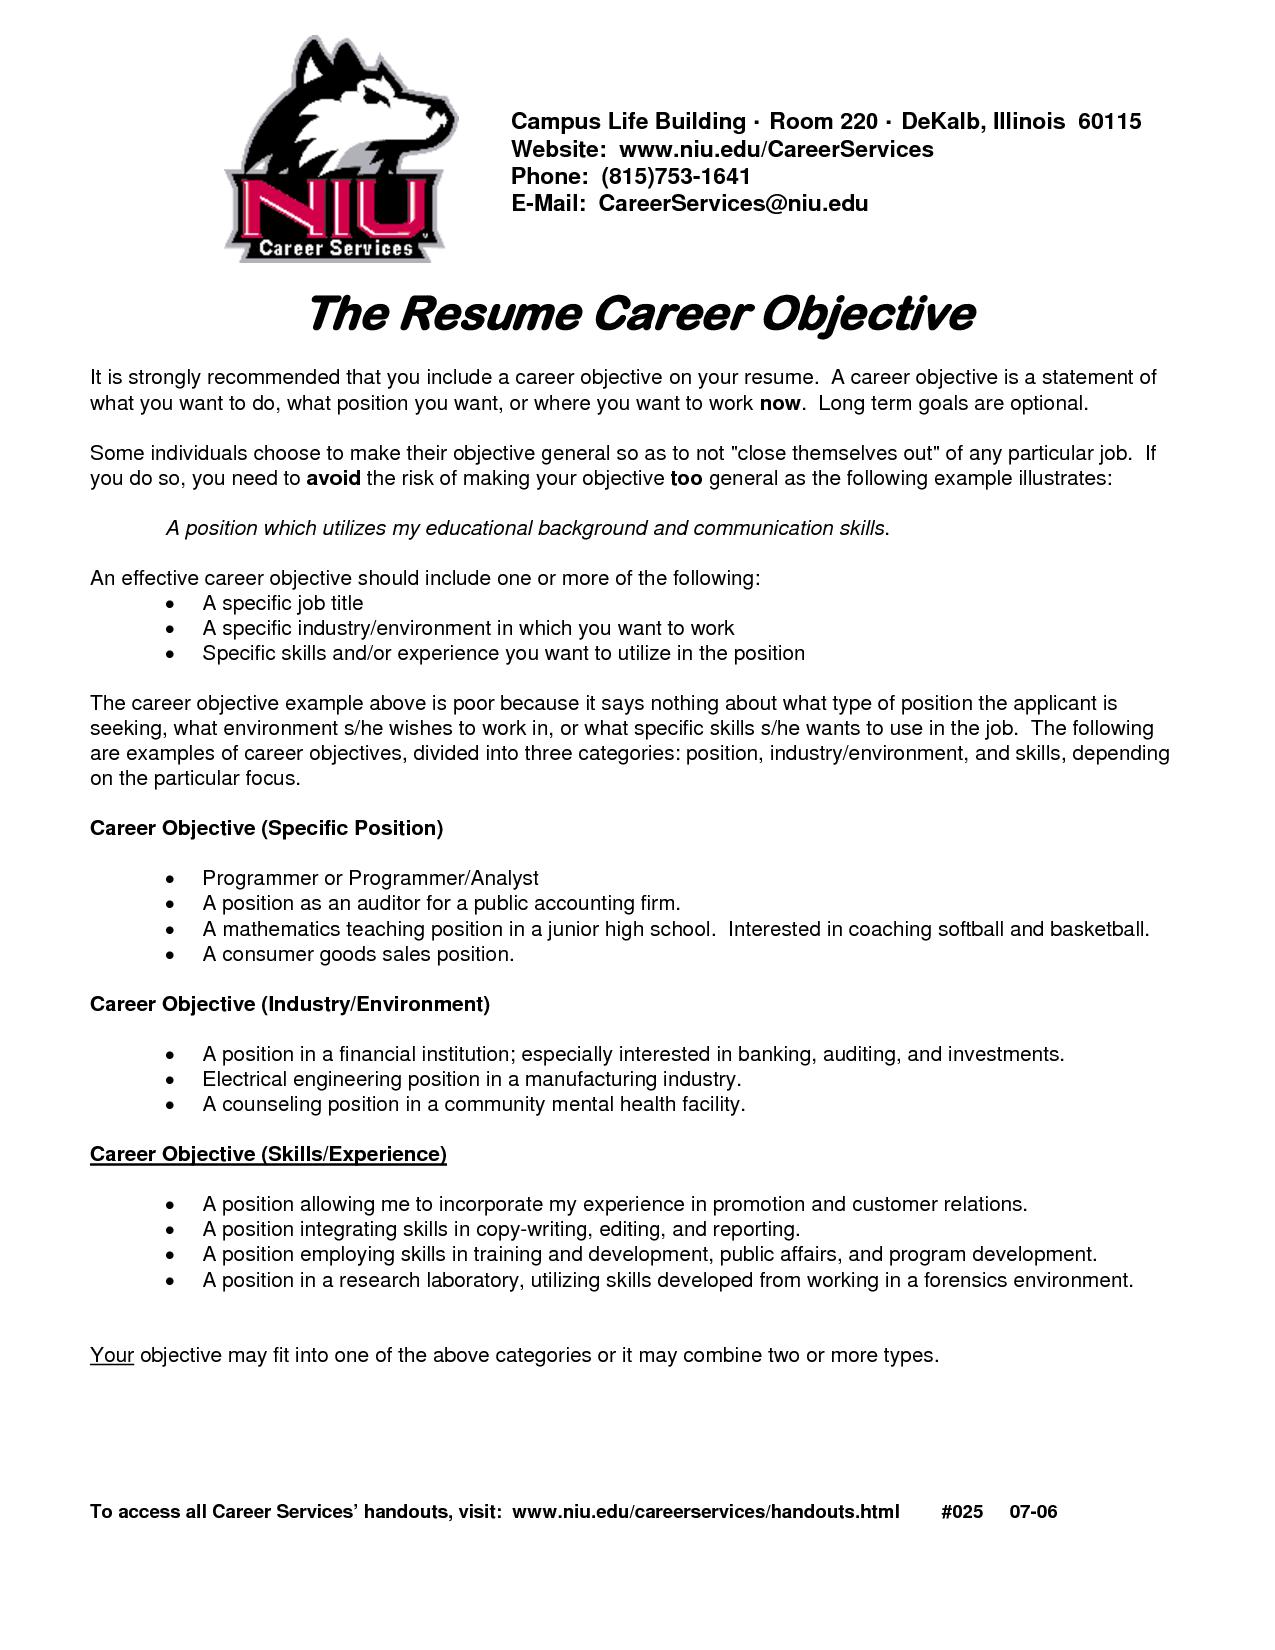 Objective Resume